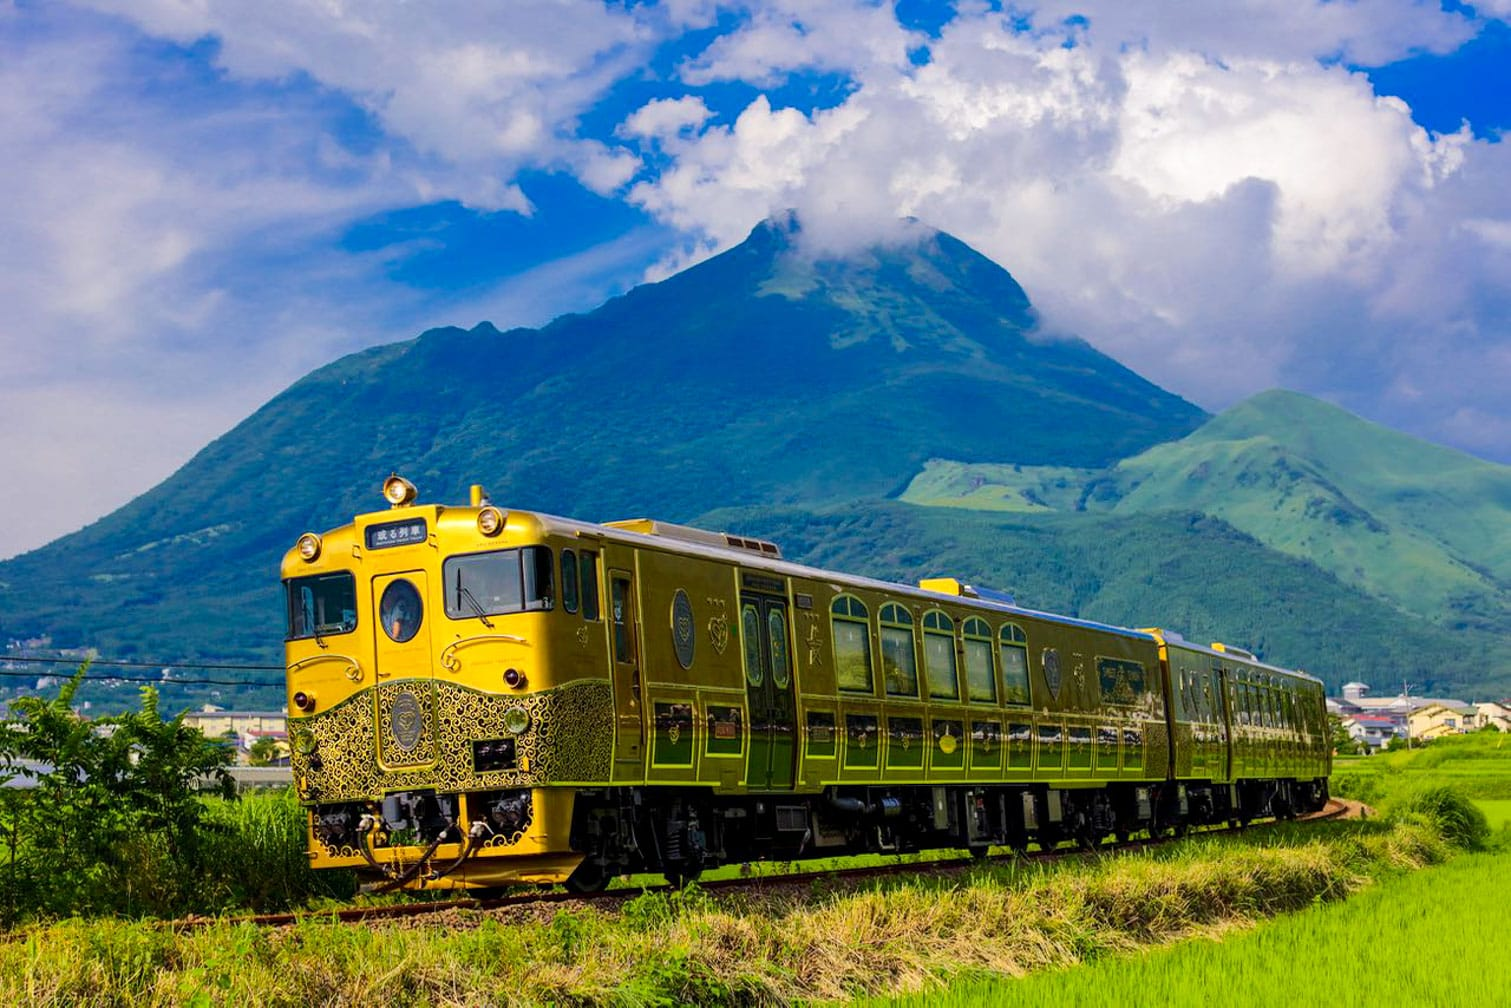 The Sweet Train going through mountains